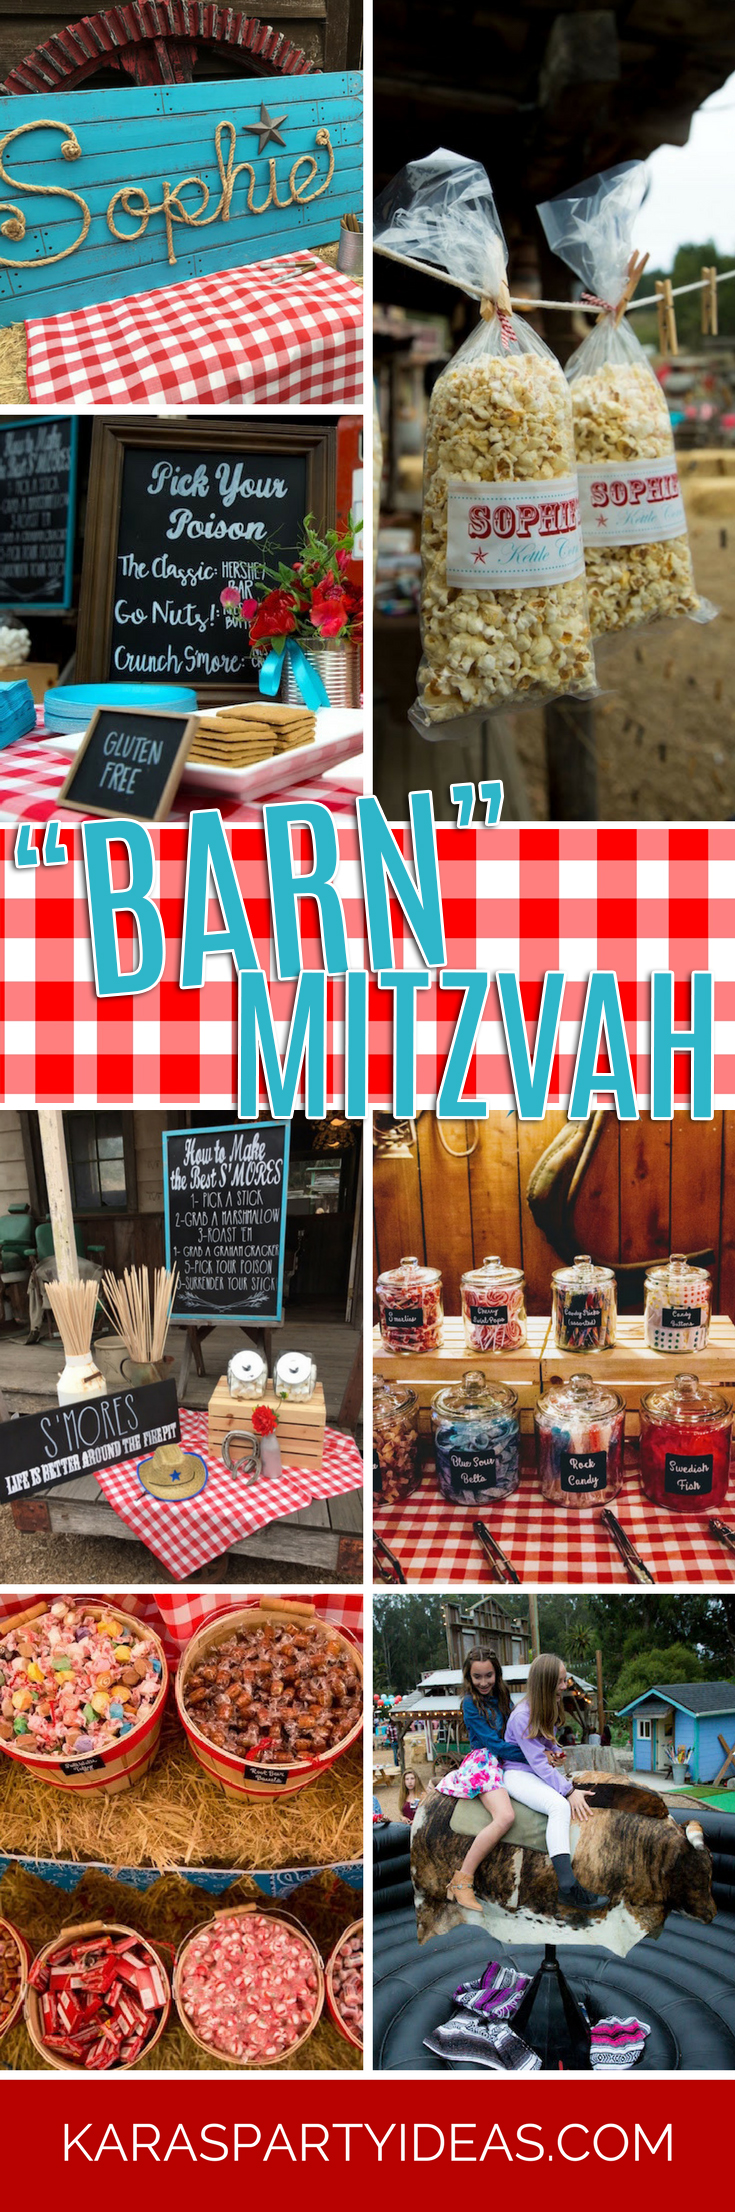 """Barn"" Mitzvah - A Barnyard Themed Bat Mitzvah via Kara's Party Ideas"